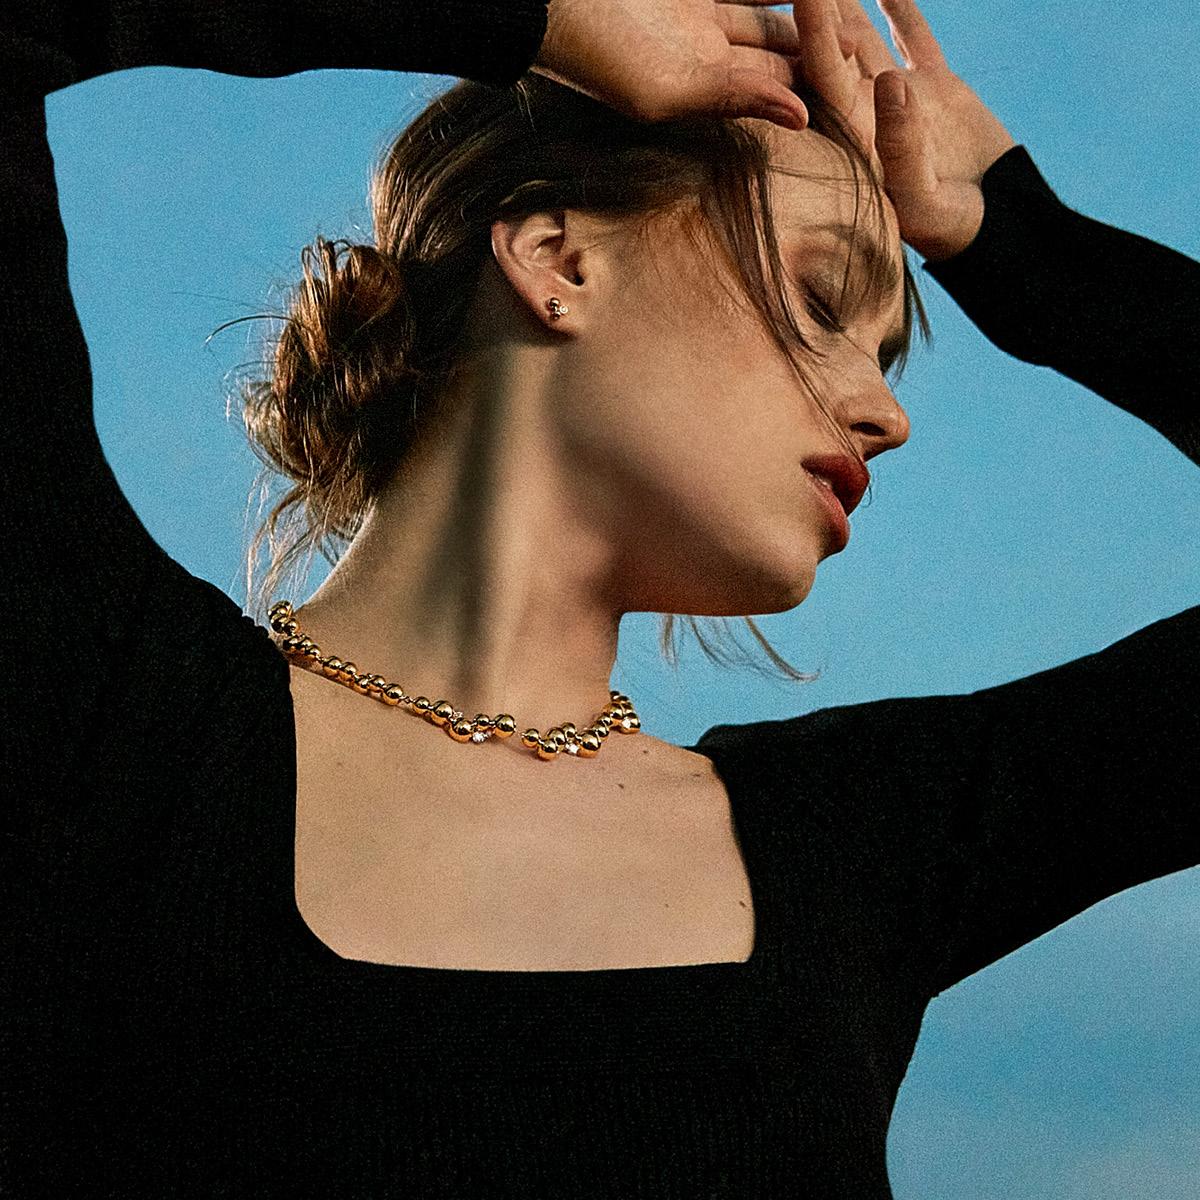 MOONLIGHT GRAPES Halskette